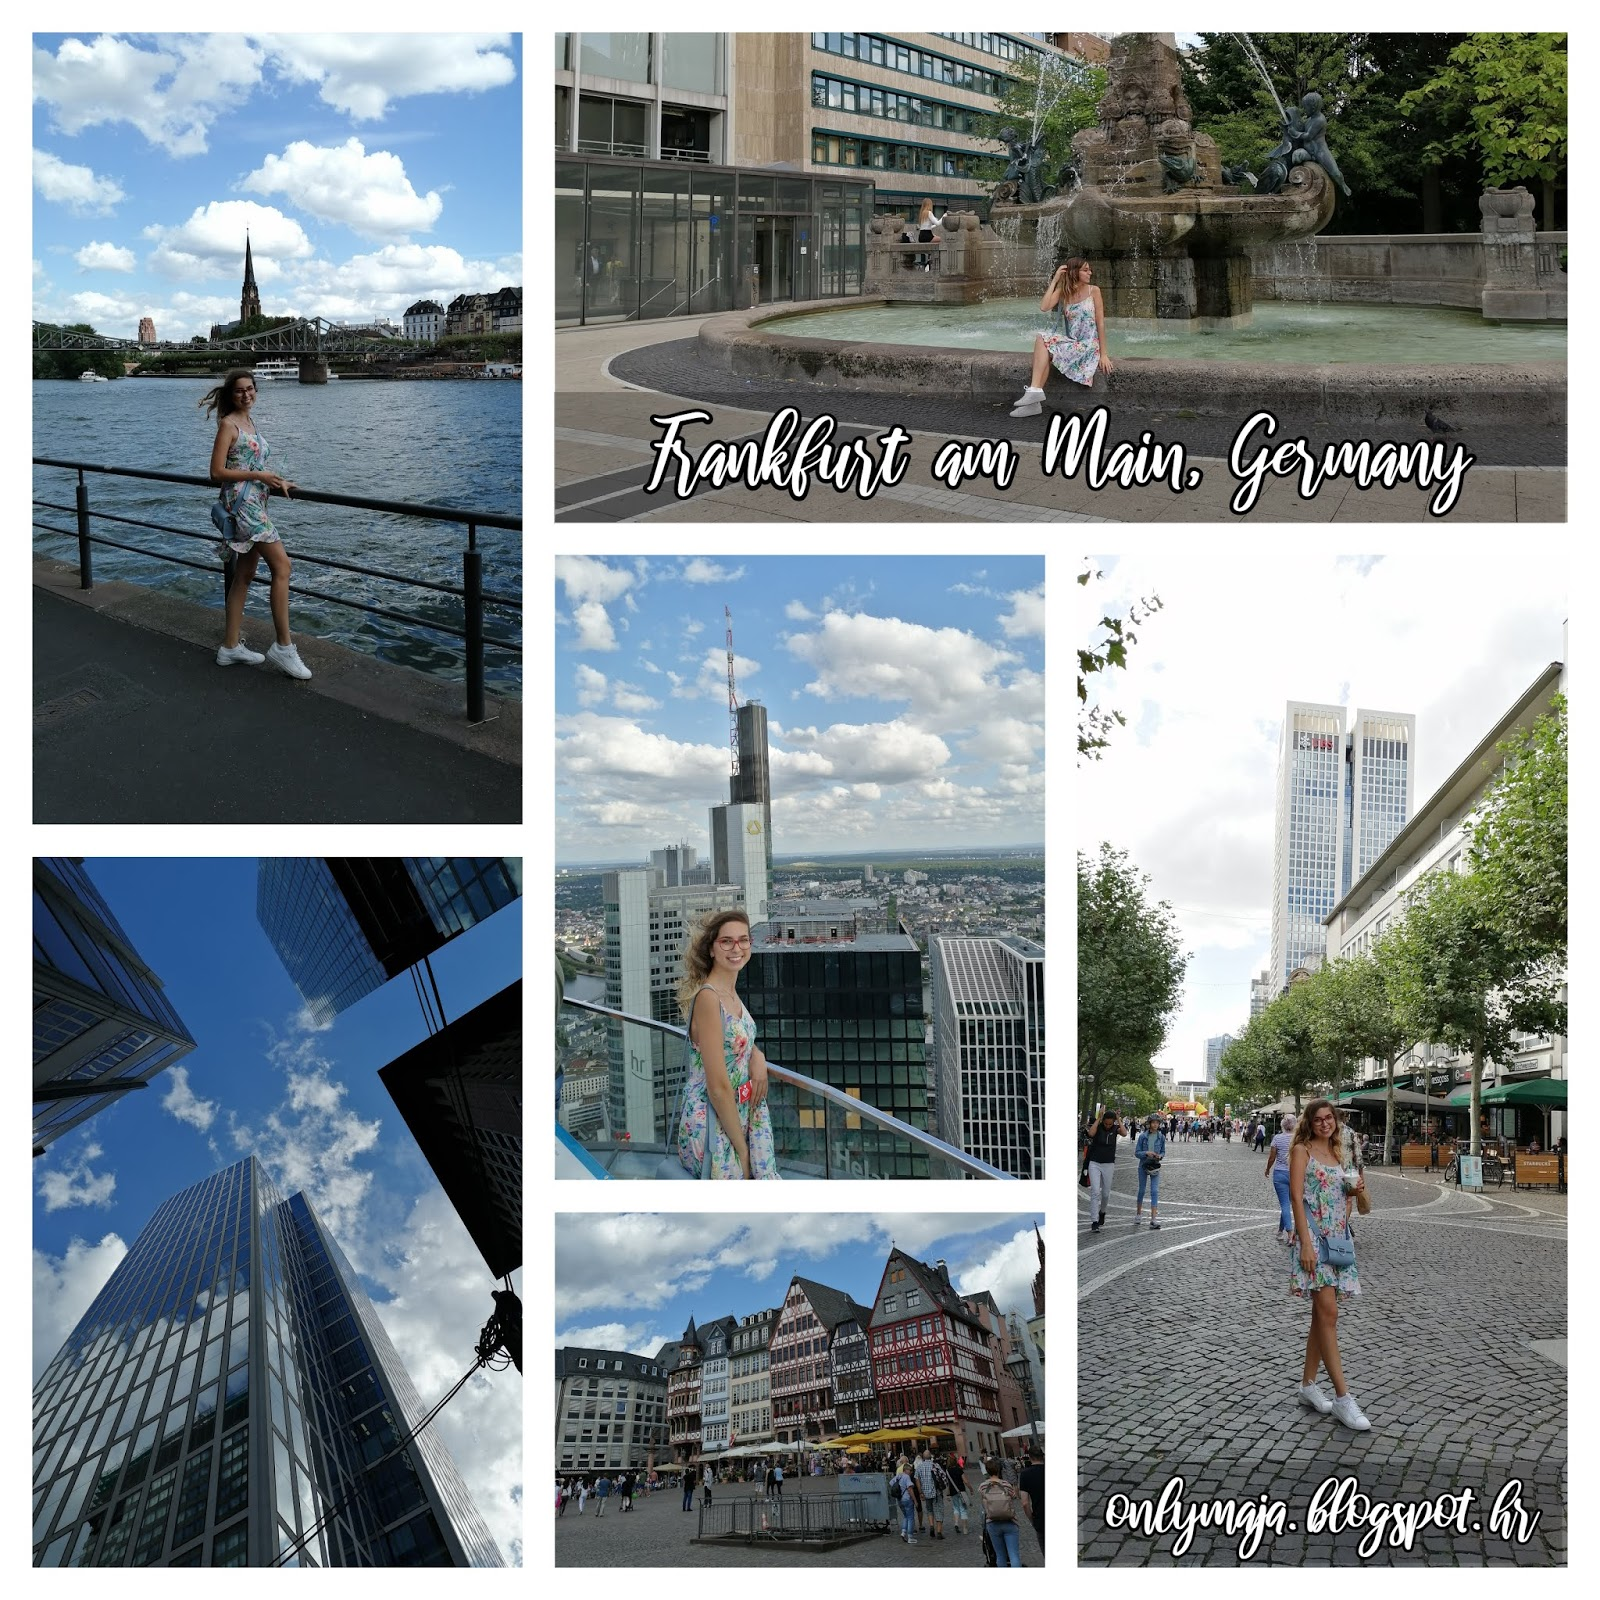 Frankfurt Am Main Germany Maja Poljarevic